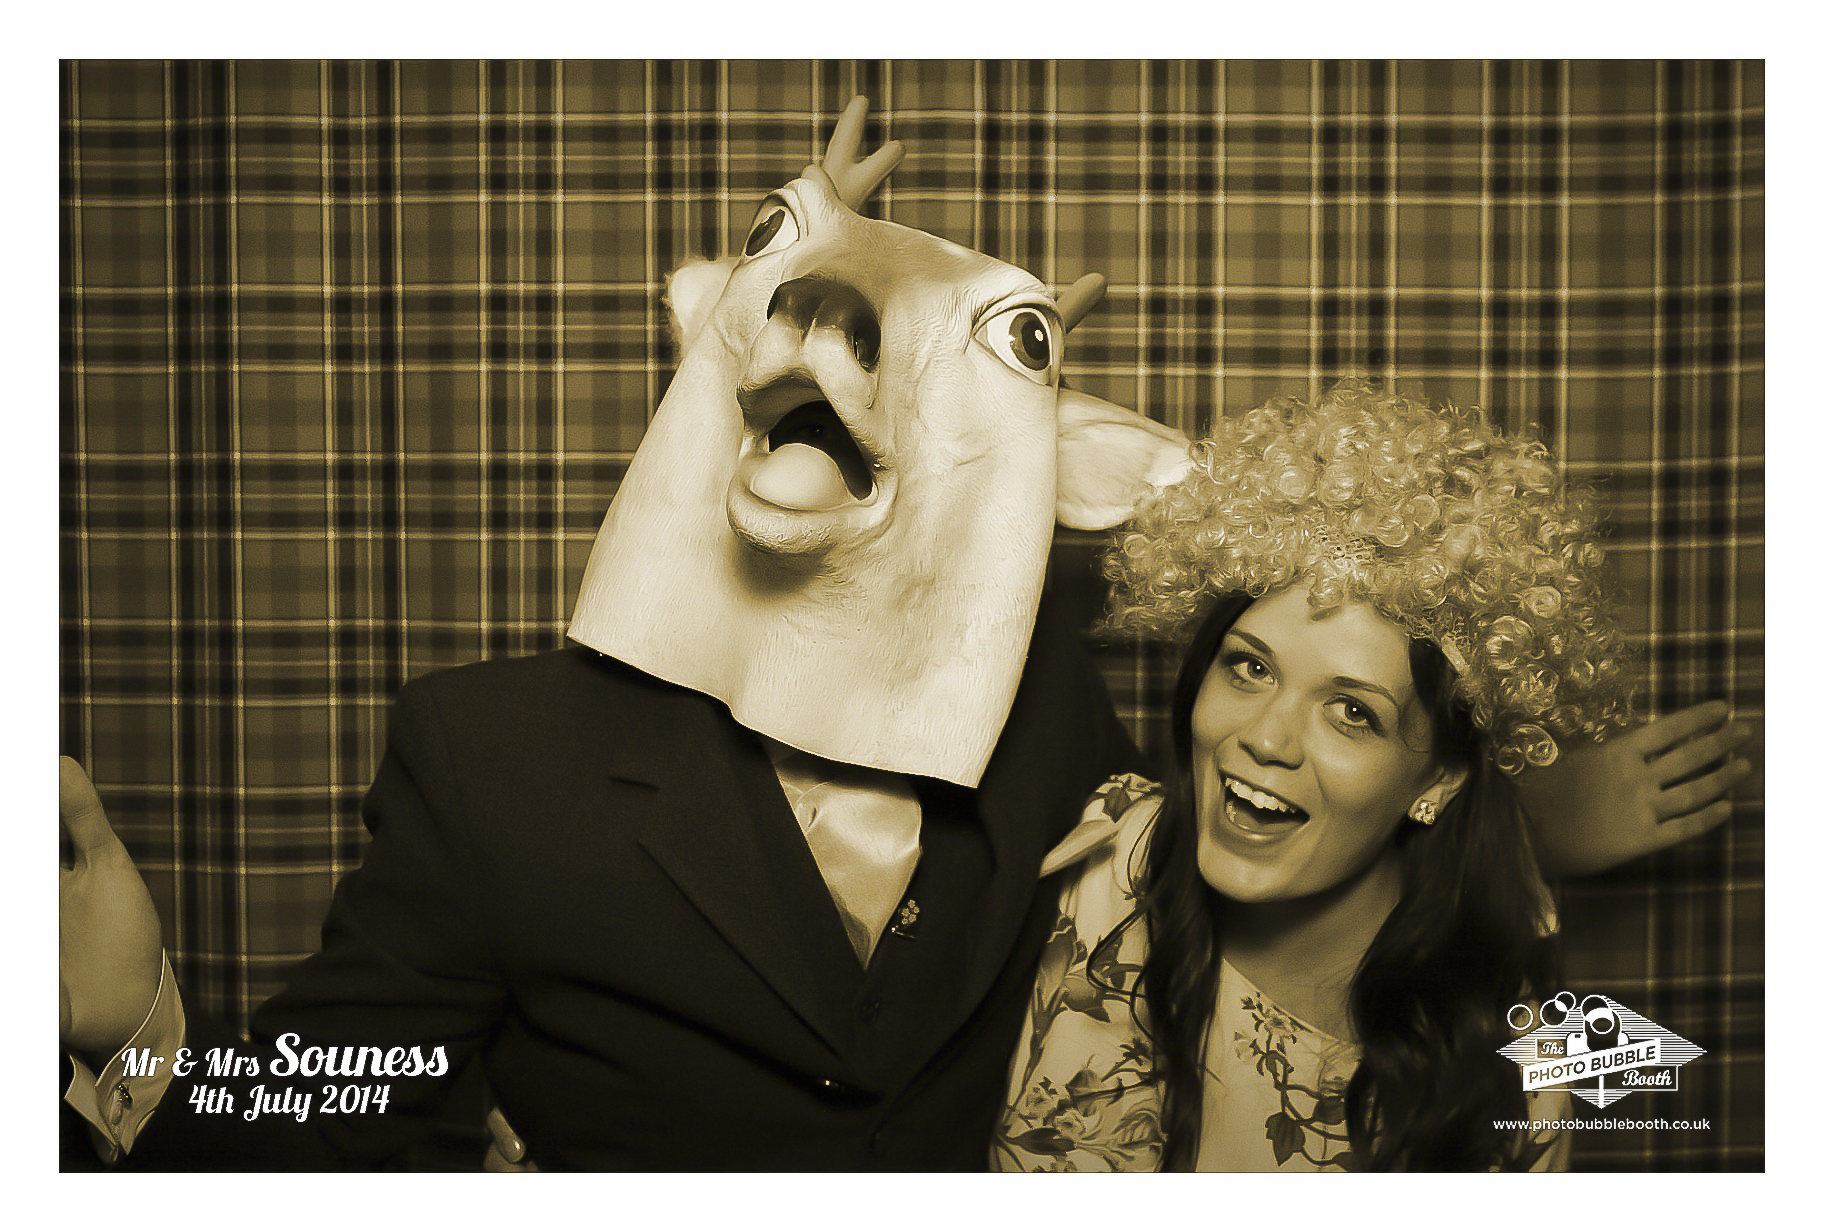 Neil & Trish Photobubble Booth_52.JPG